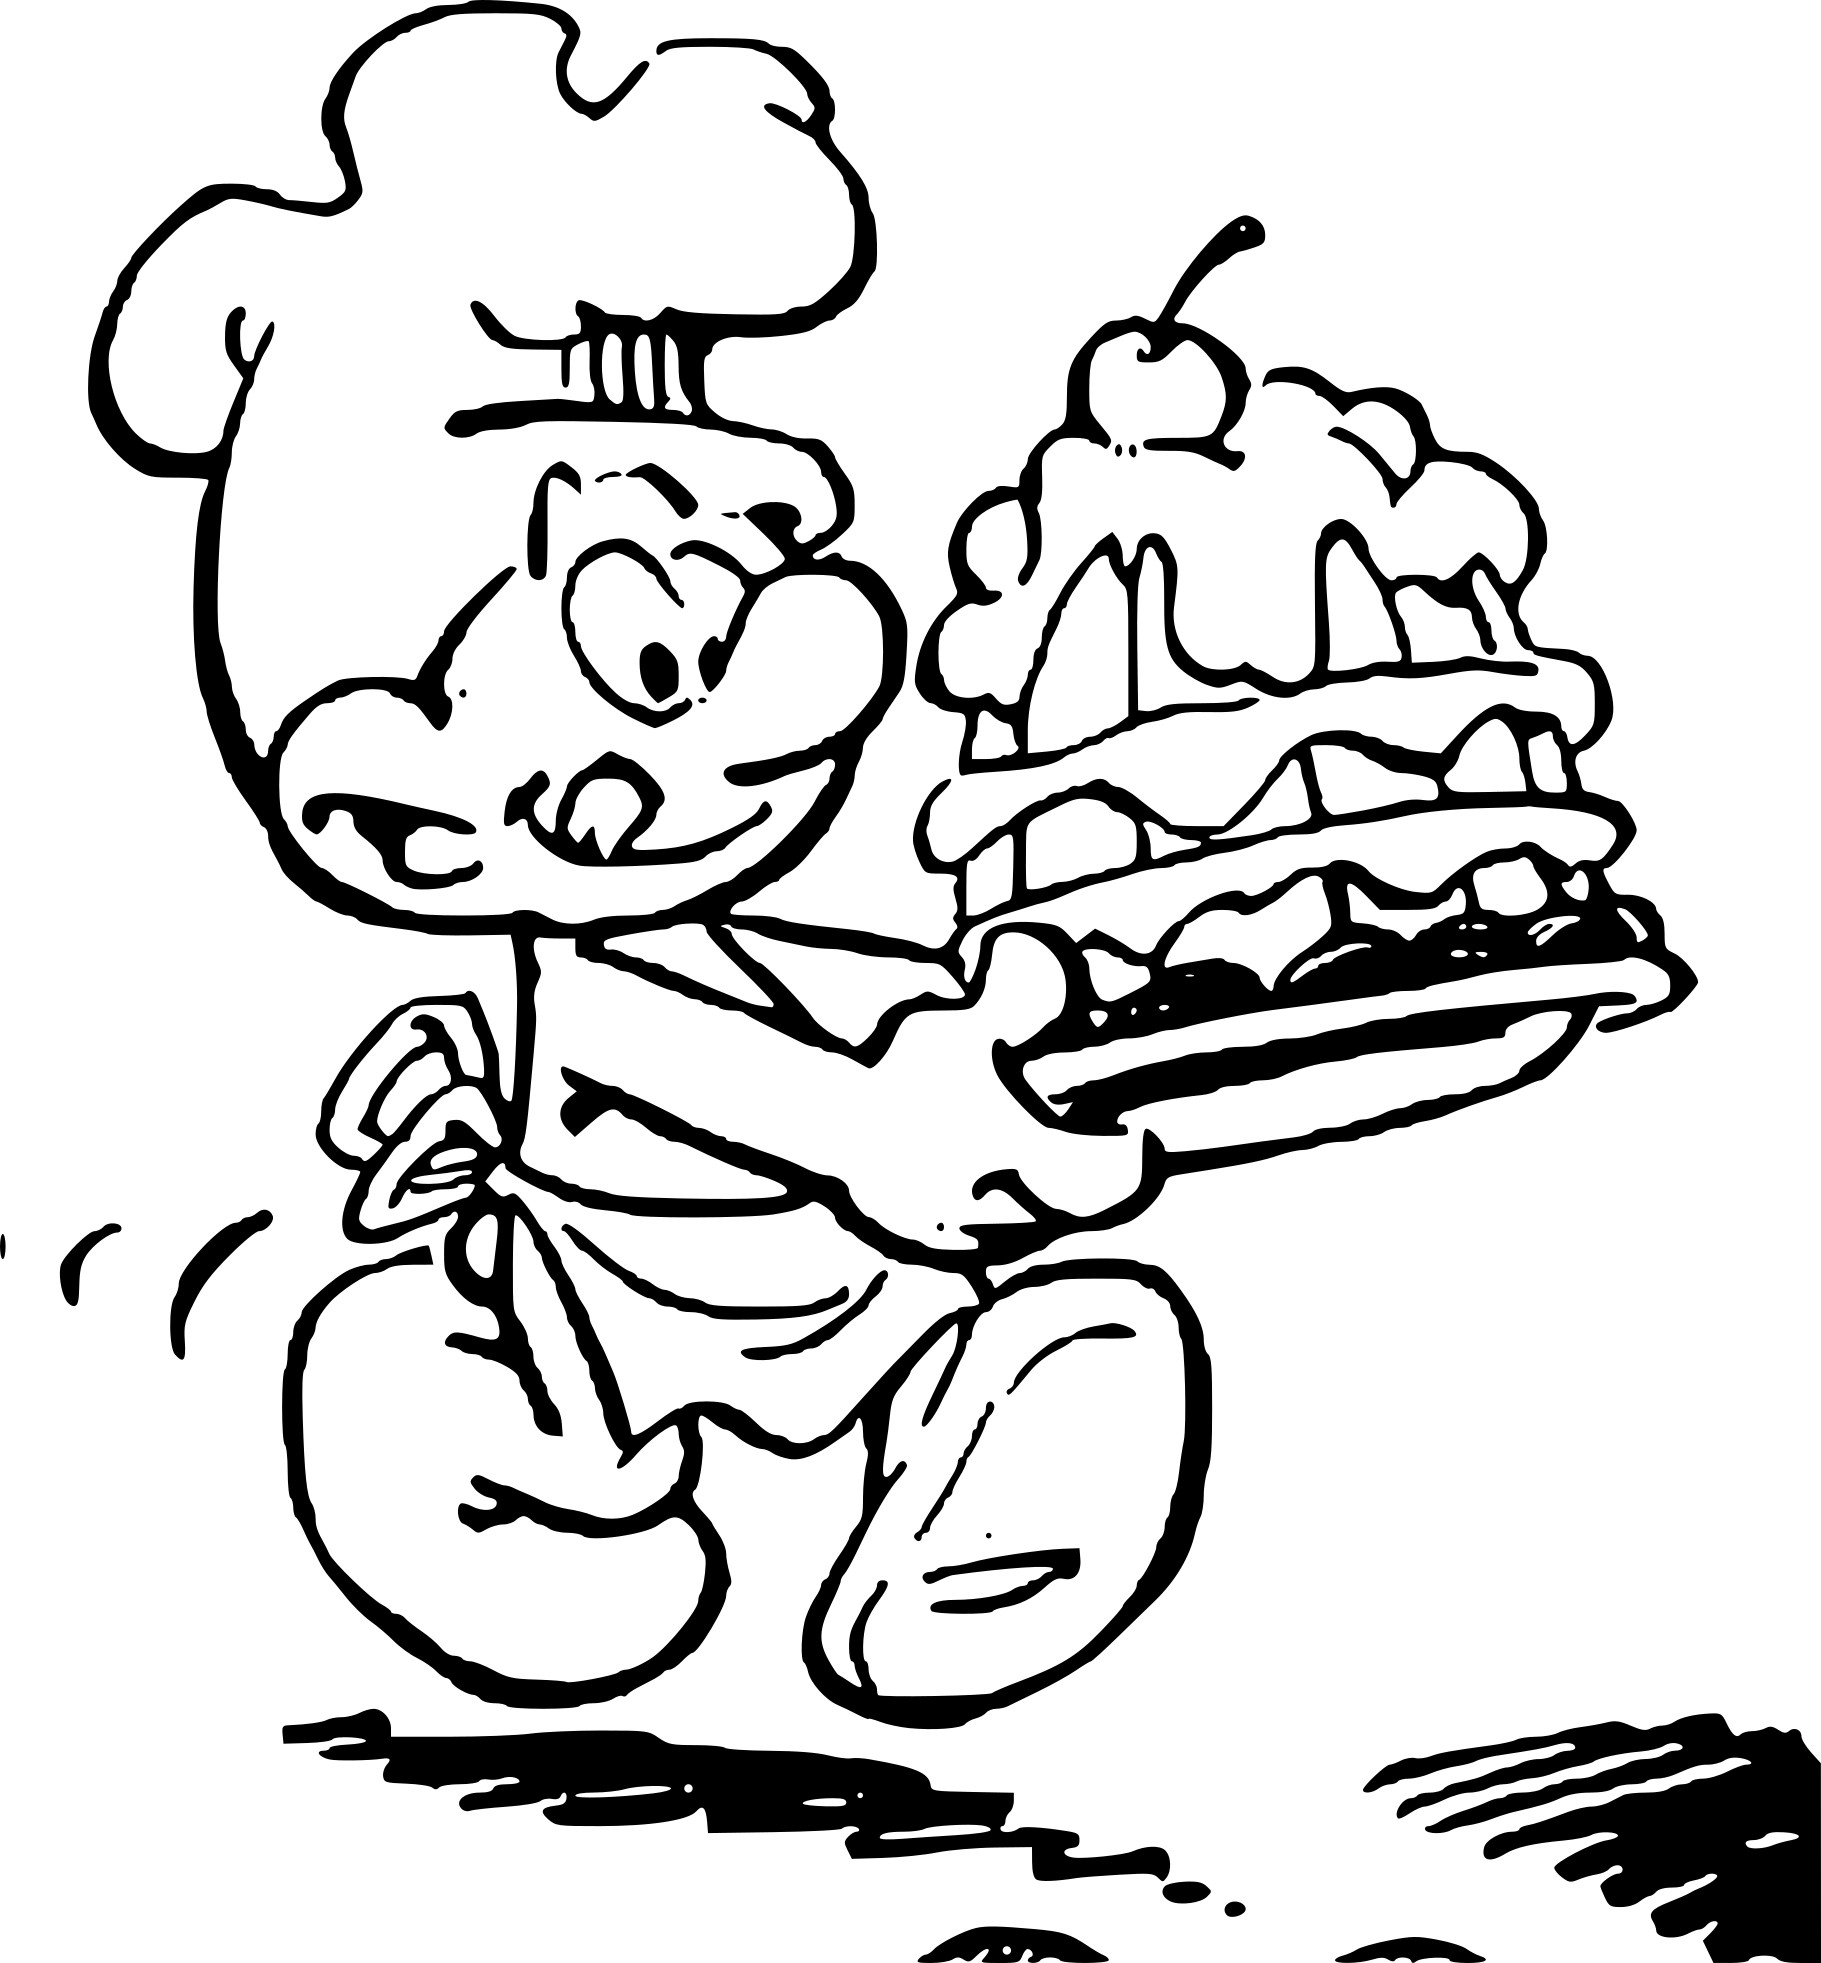 Coloriage Schtroumpf cuisinier